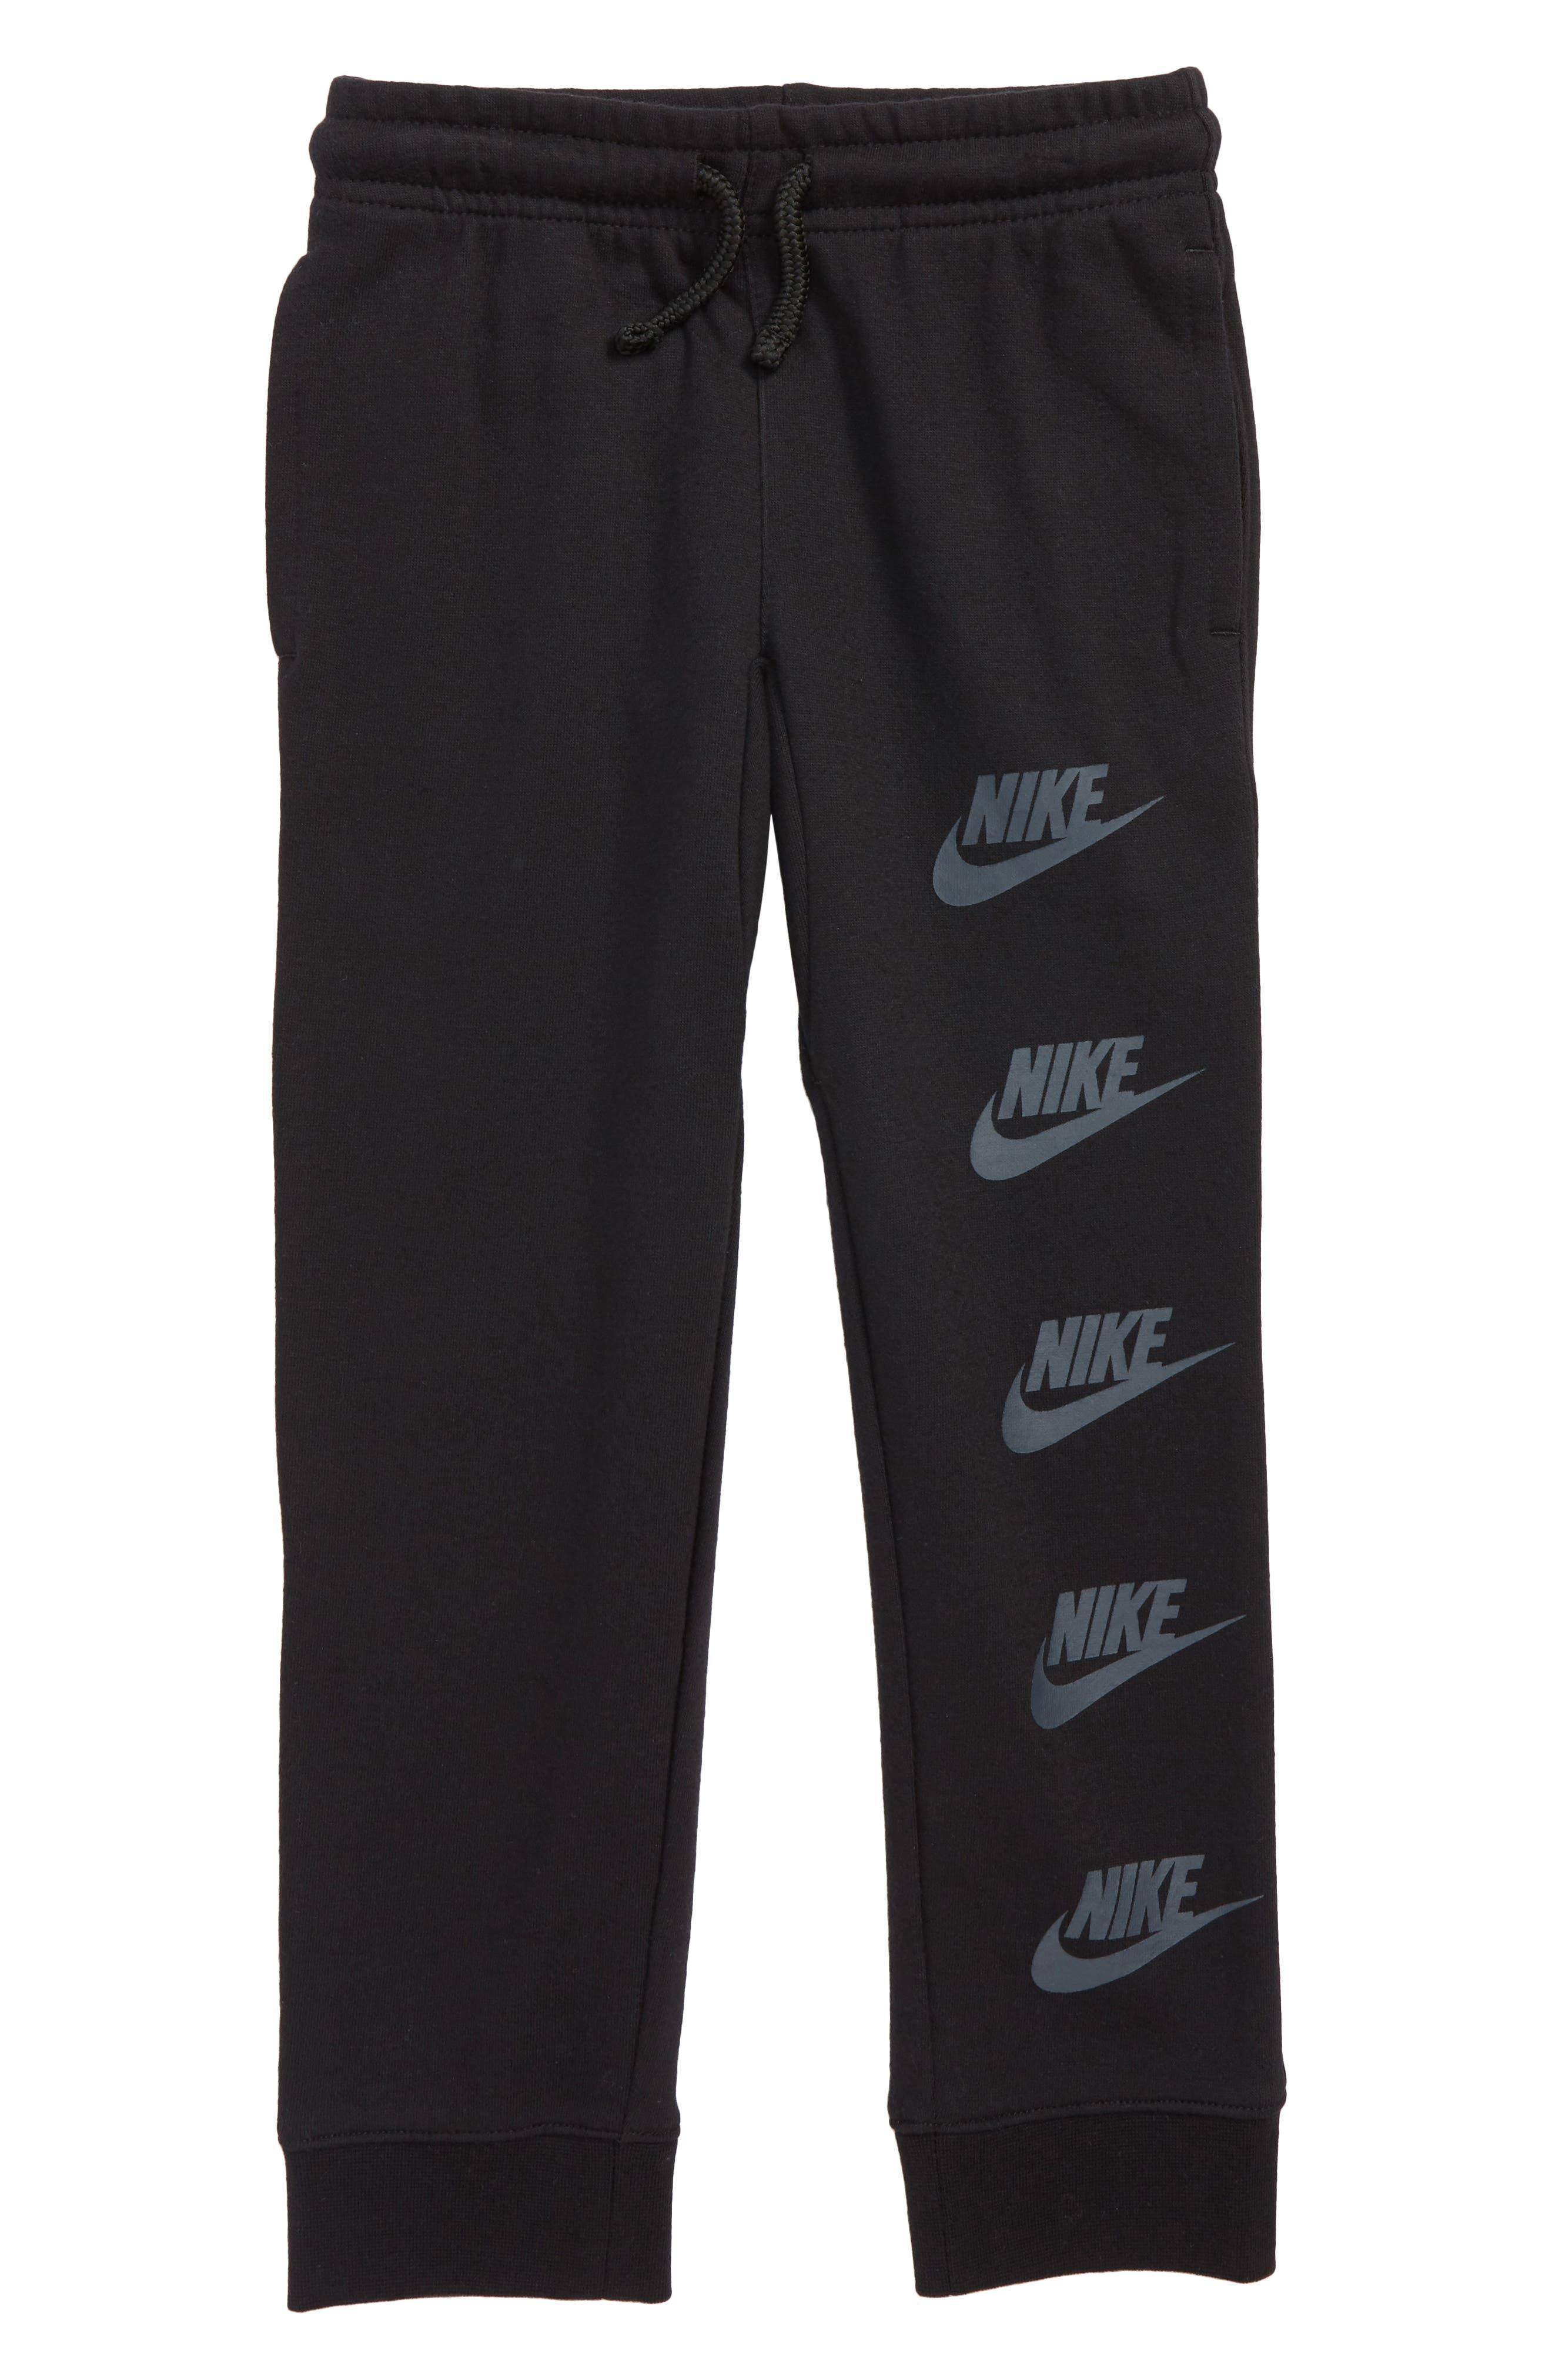 Sportswear Club Archive Fleece Sweatpants,                             Main thumbnail 1, color,                             BLACK